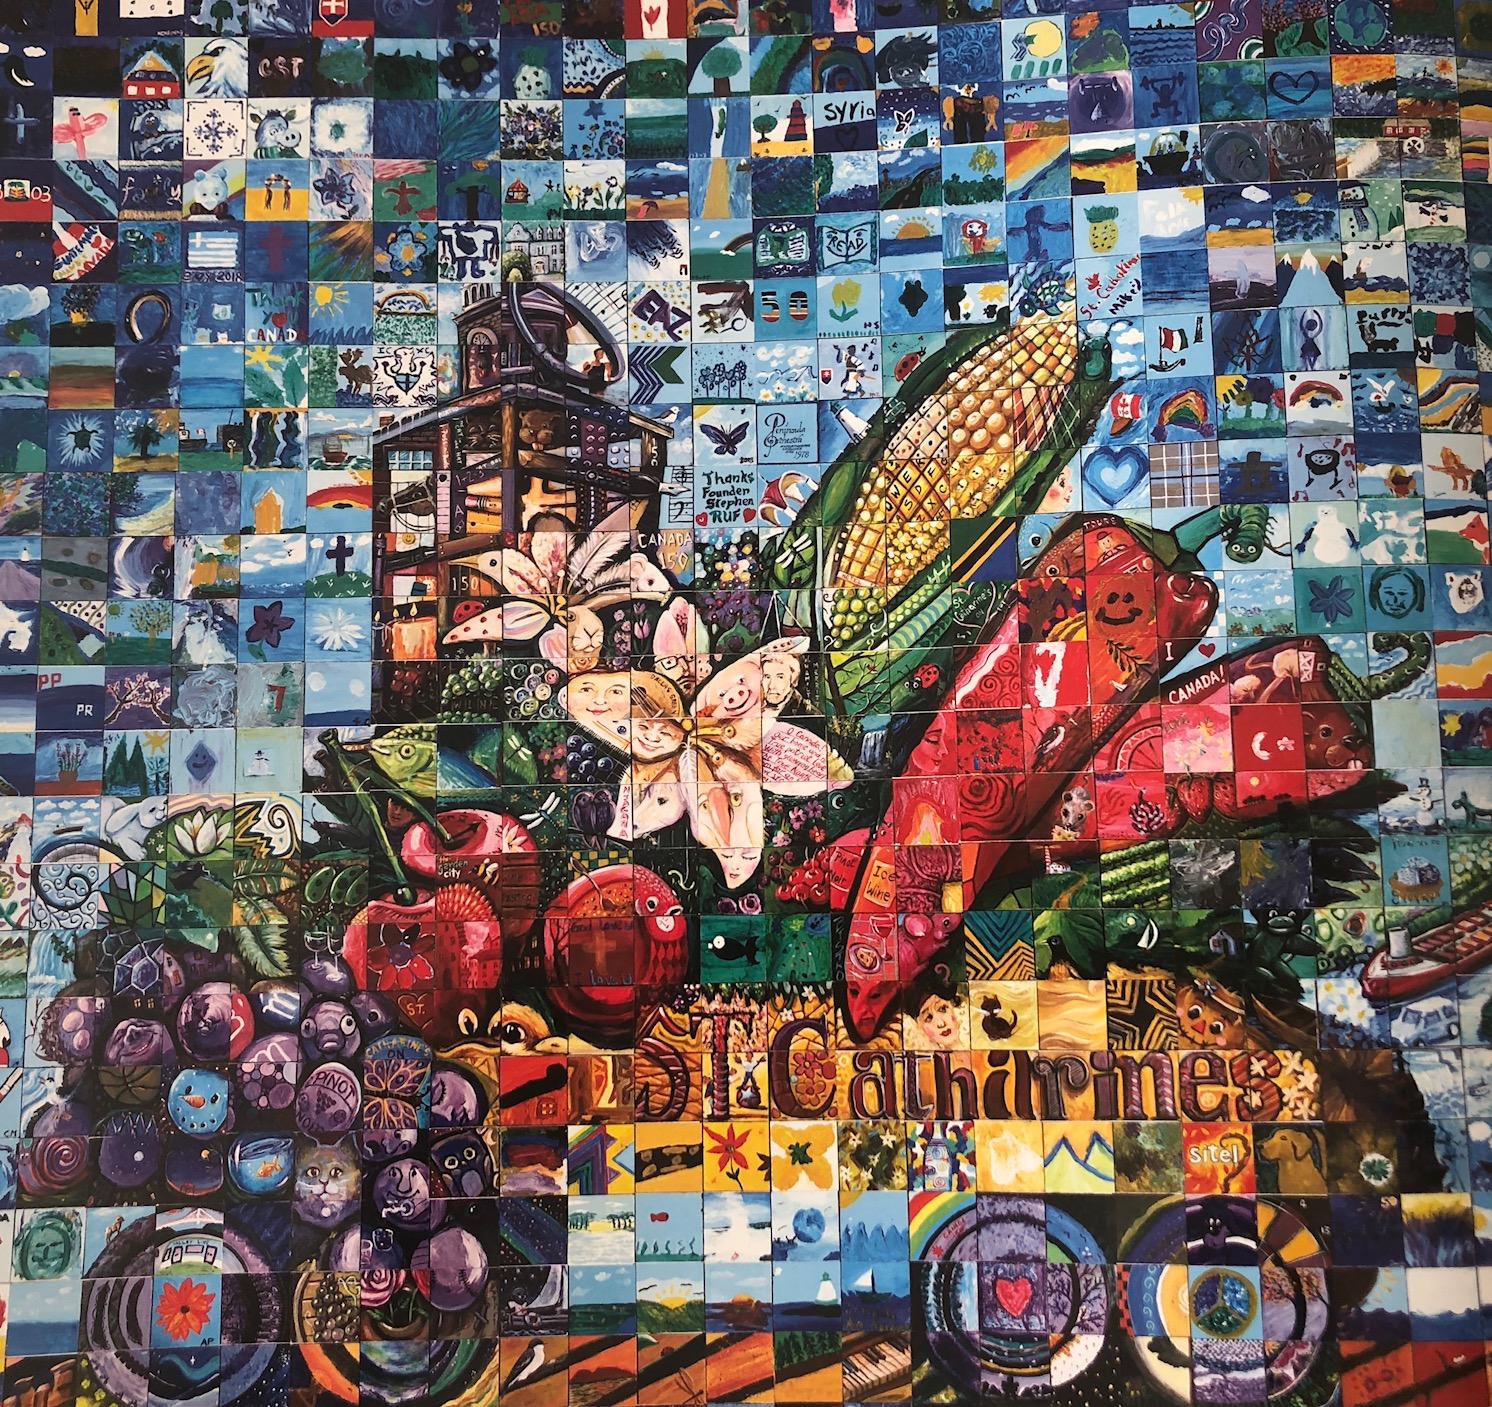 St. Catharines Ontario Canada 150 mural